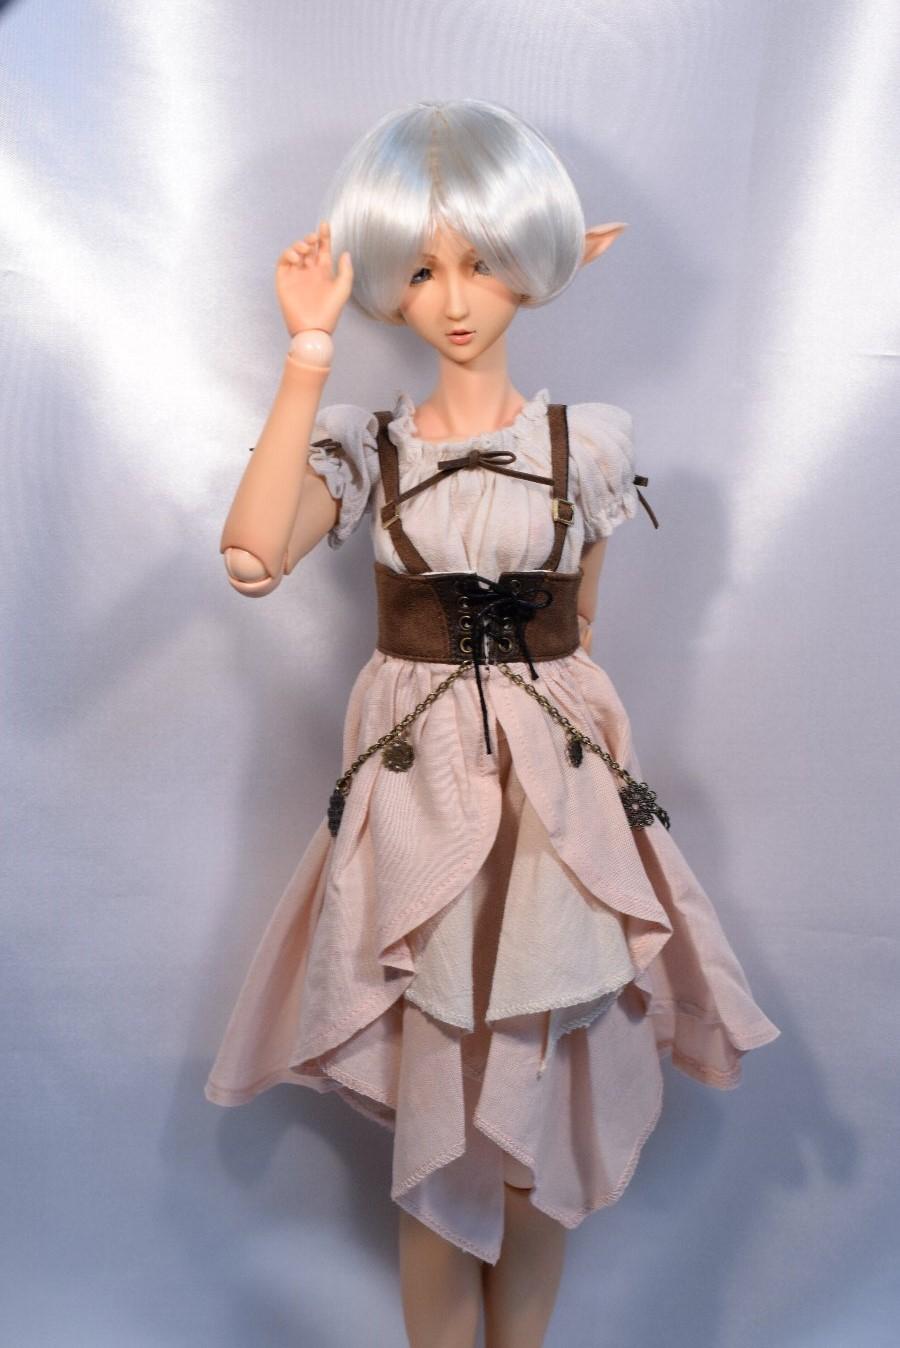 doll_654.jpg